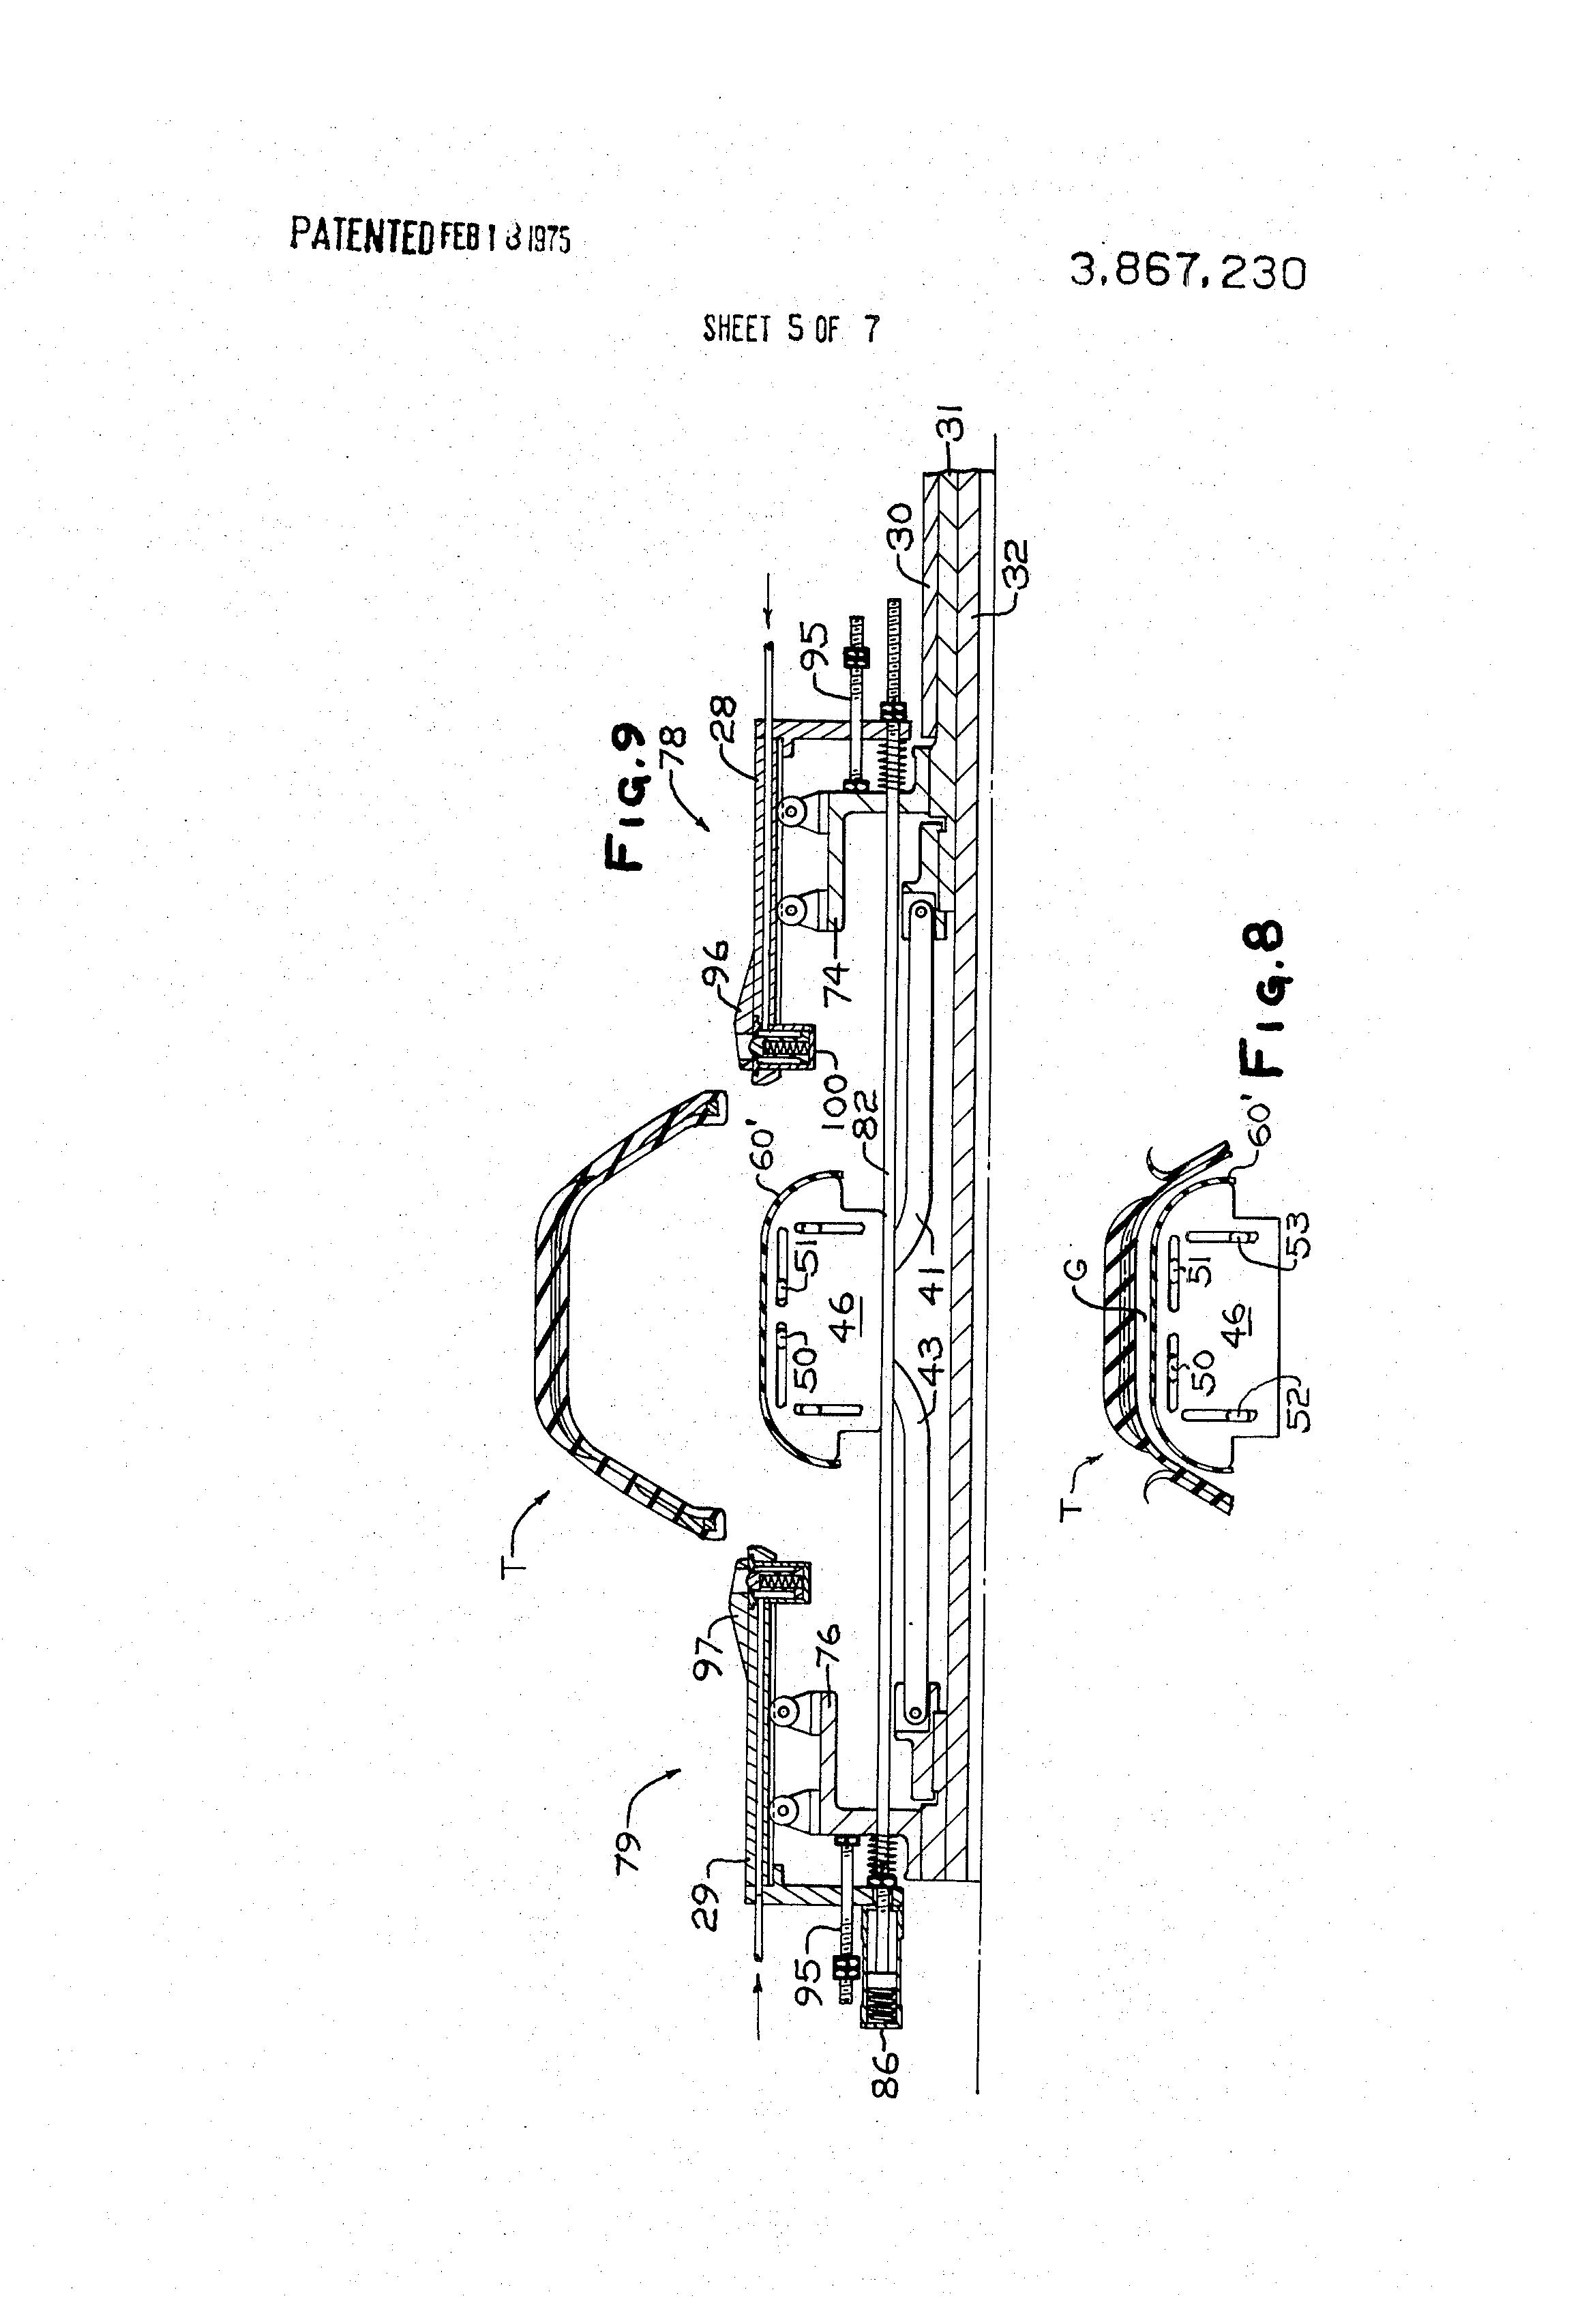 Us3867230 Tire Building Machine Google Schematic Diagram 7230 Patent Drawing